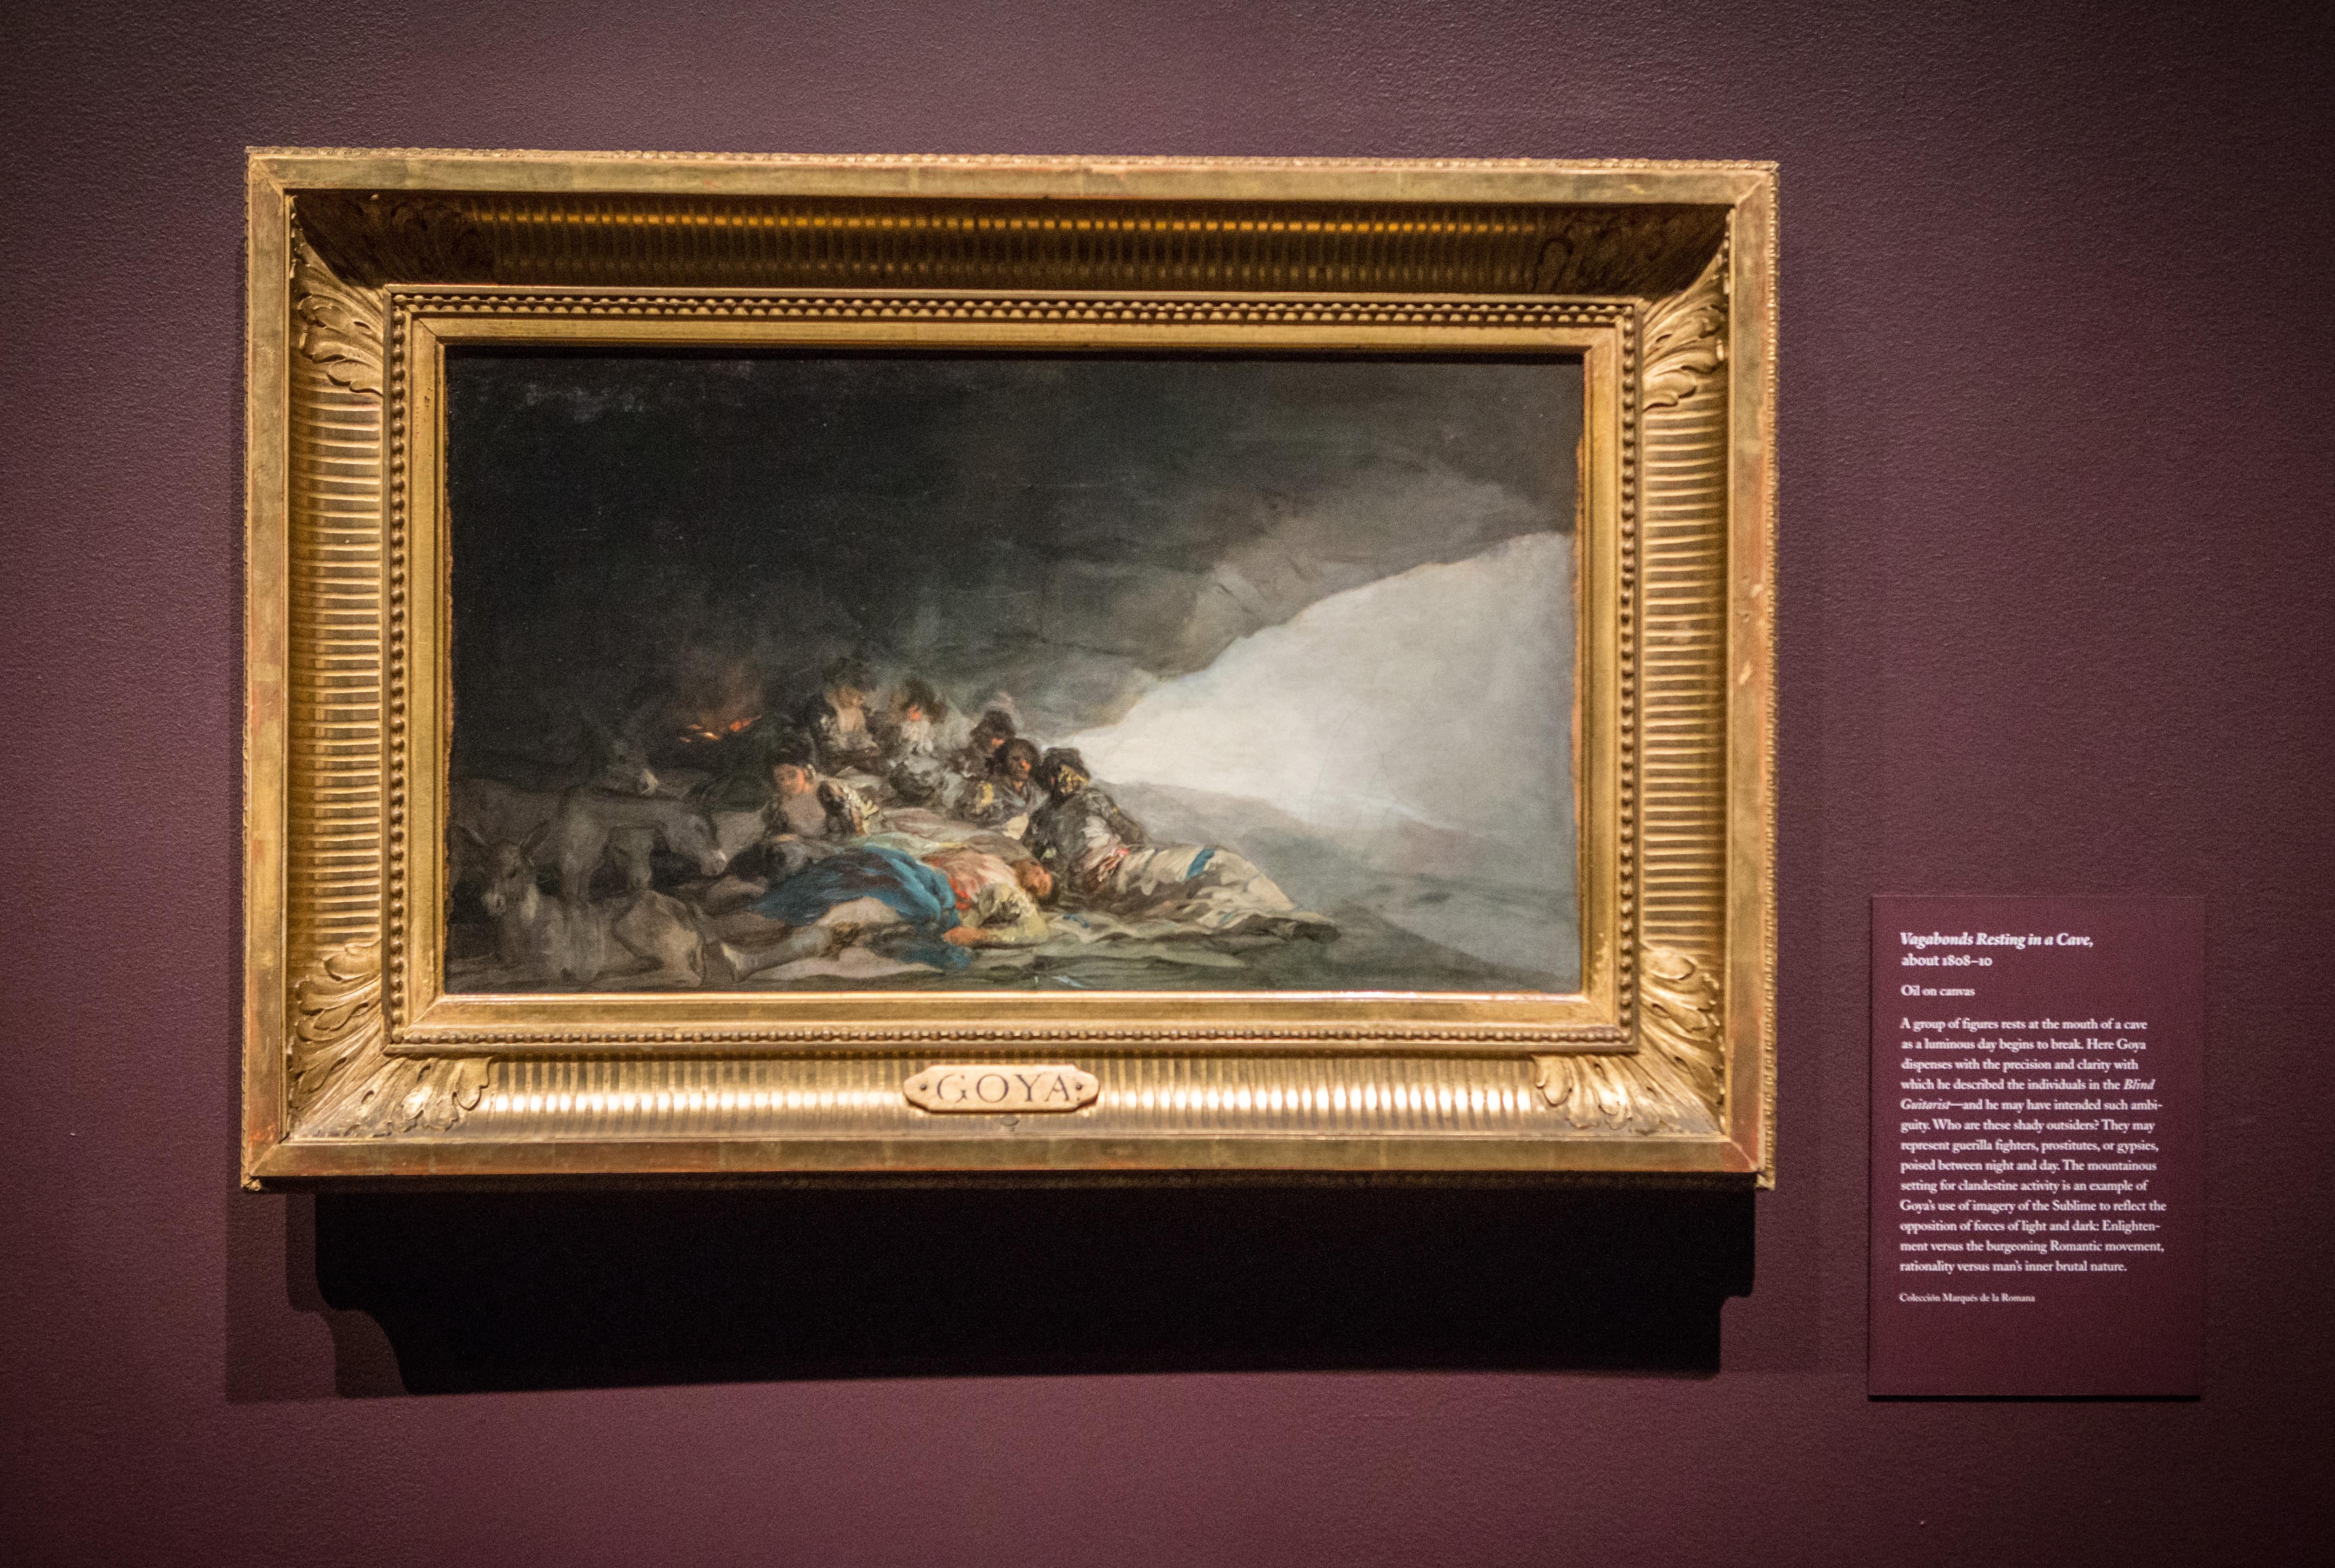 Model Hooker Goya